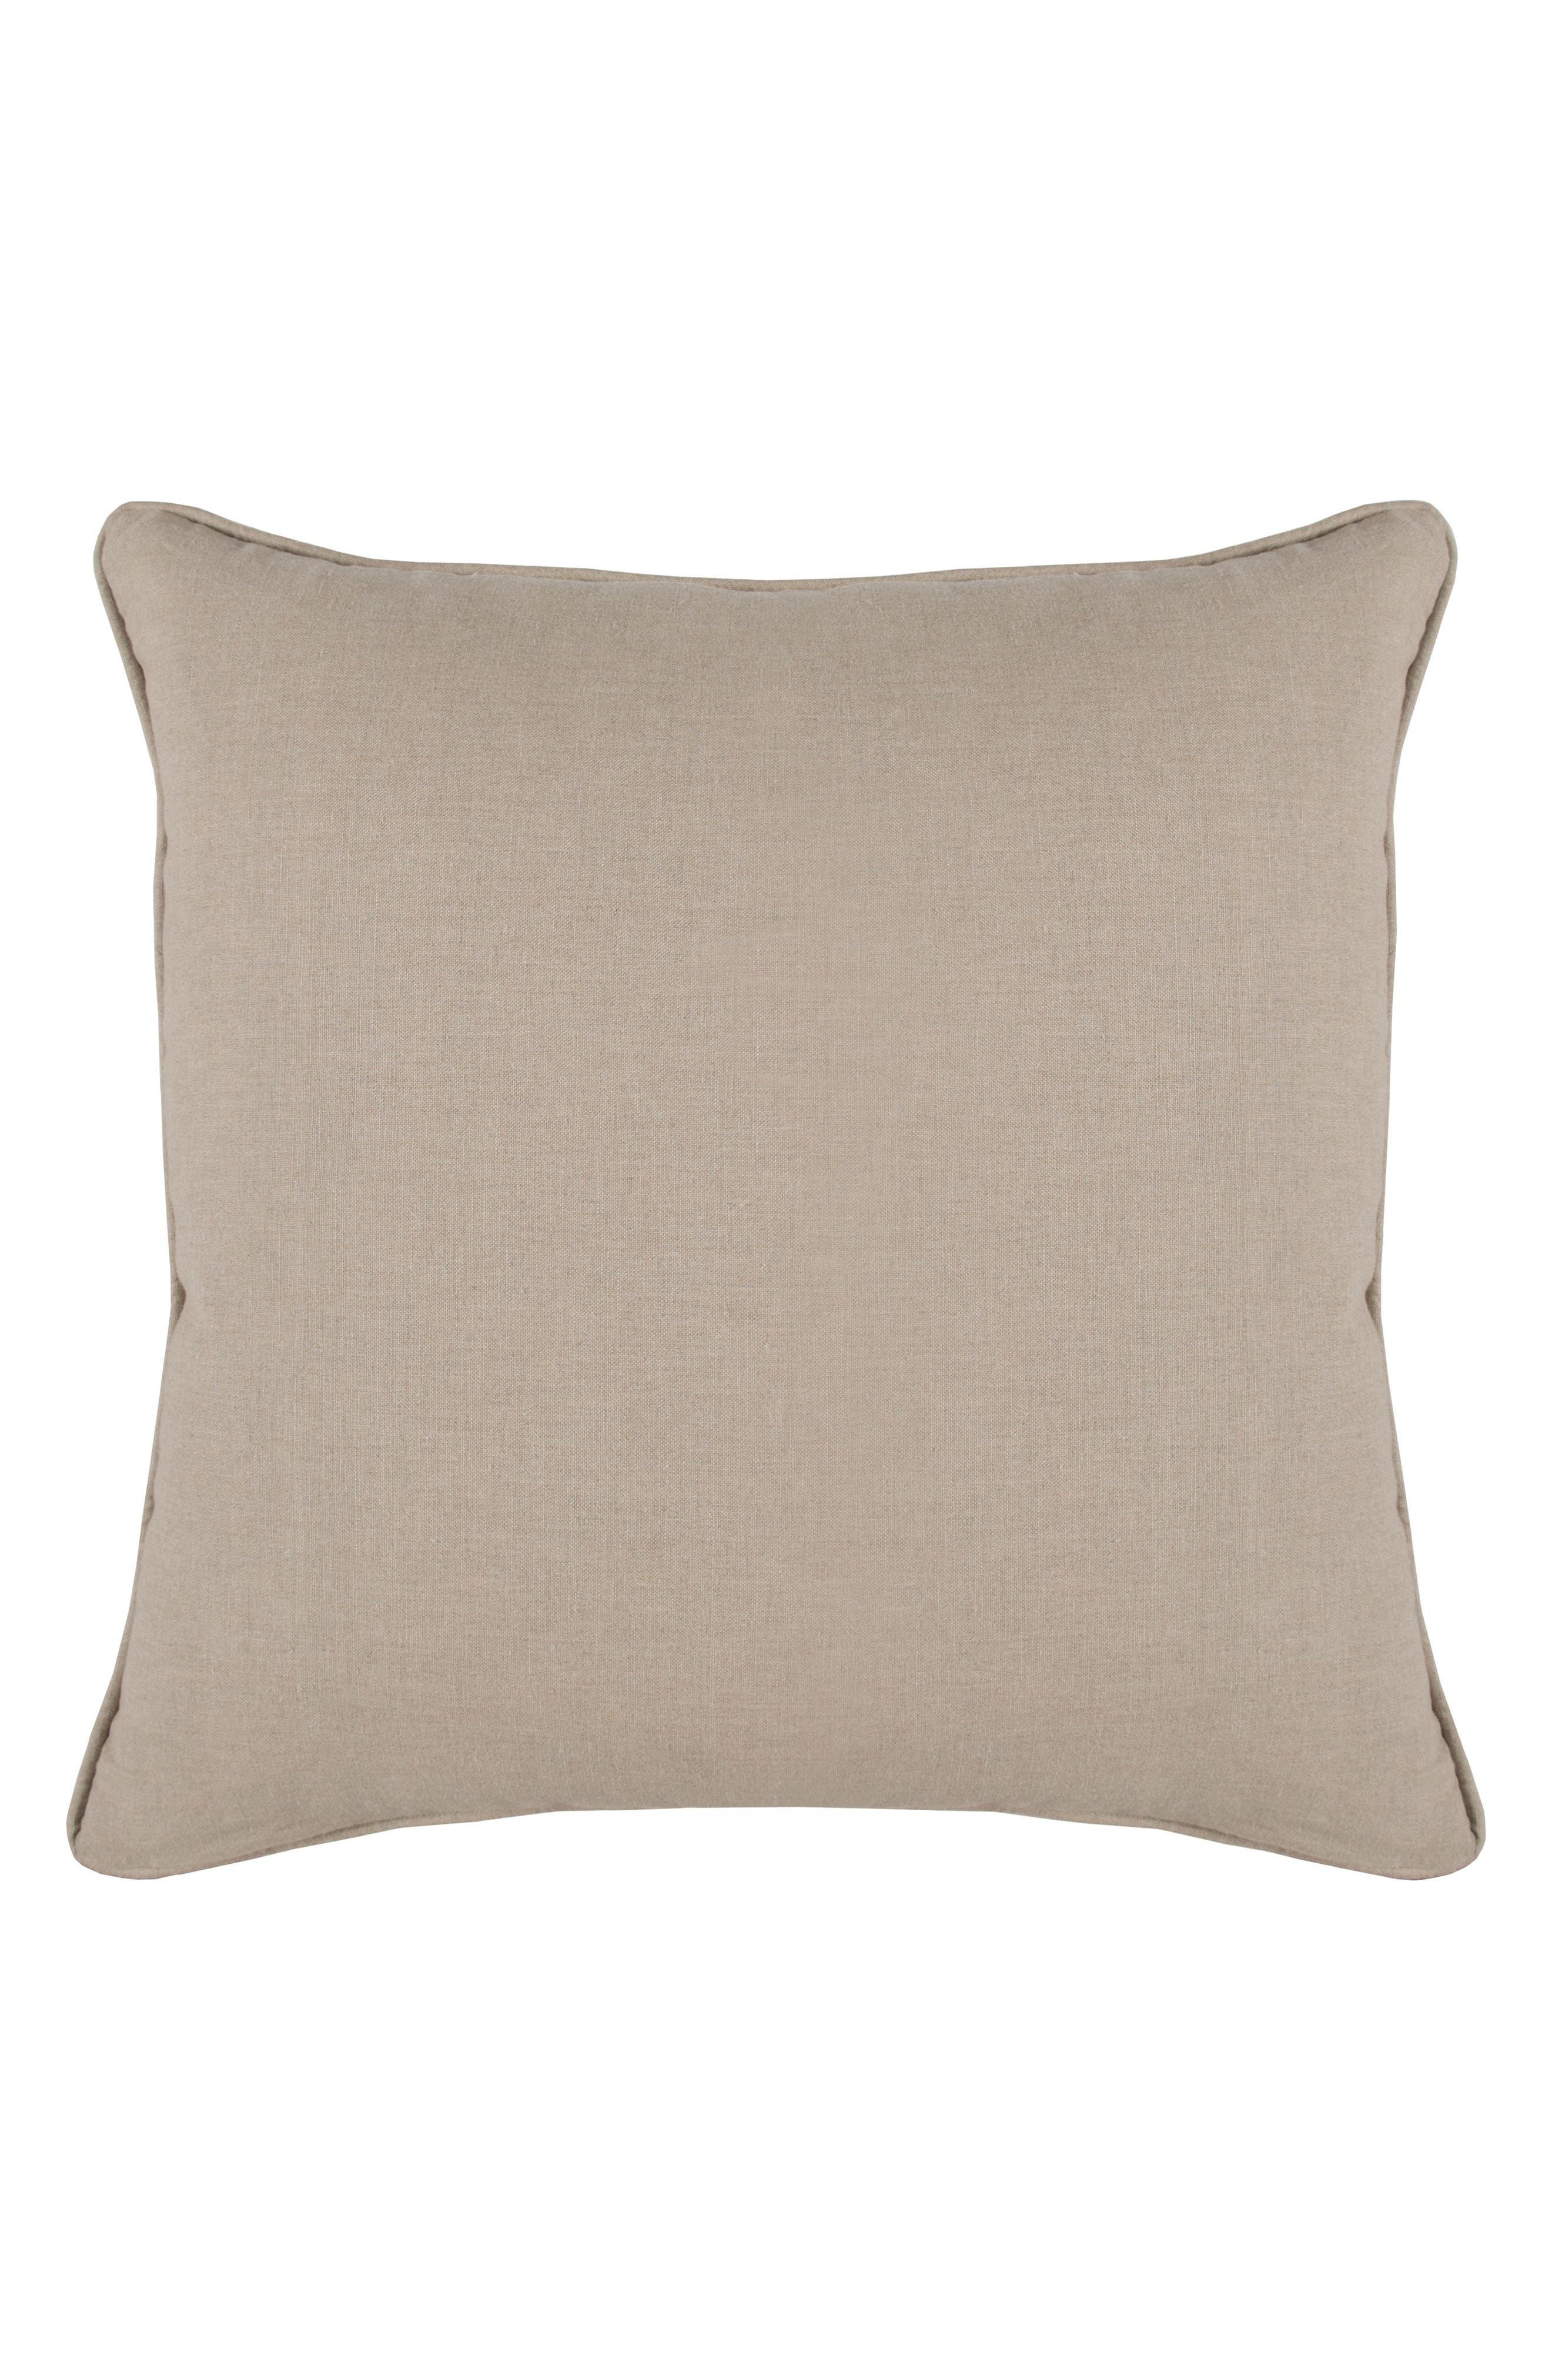 Luri Accent Pillow,                             Alternate thumbnail 2, color,                             250